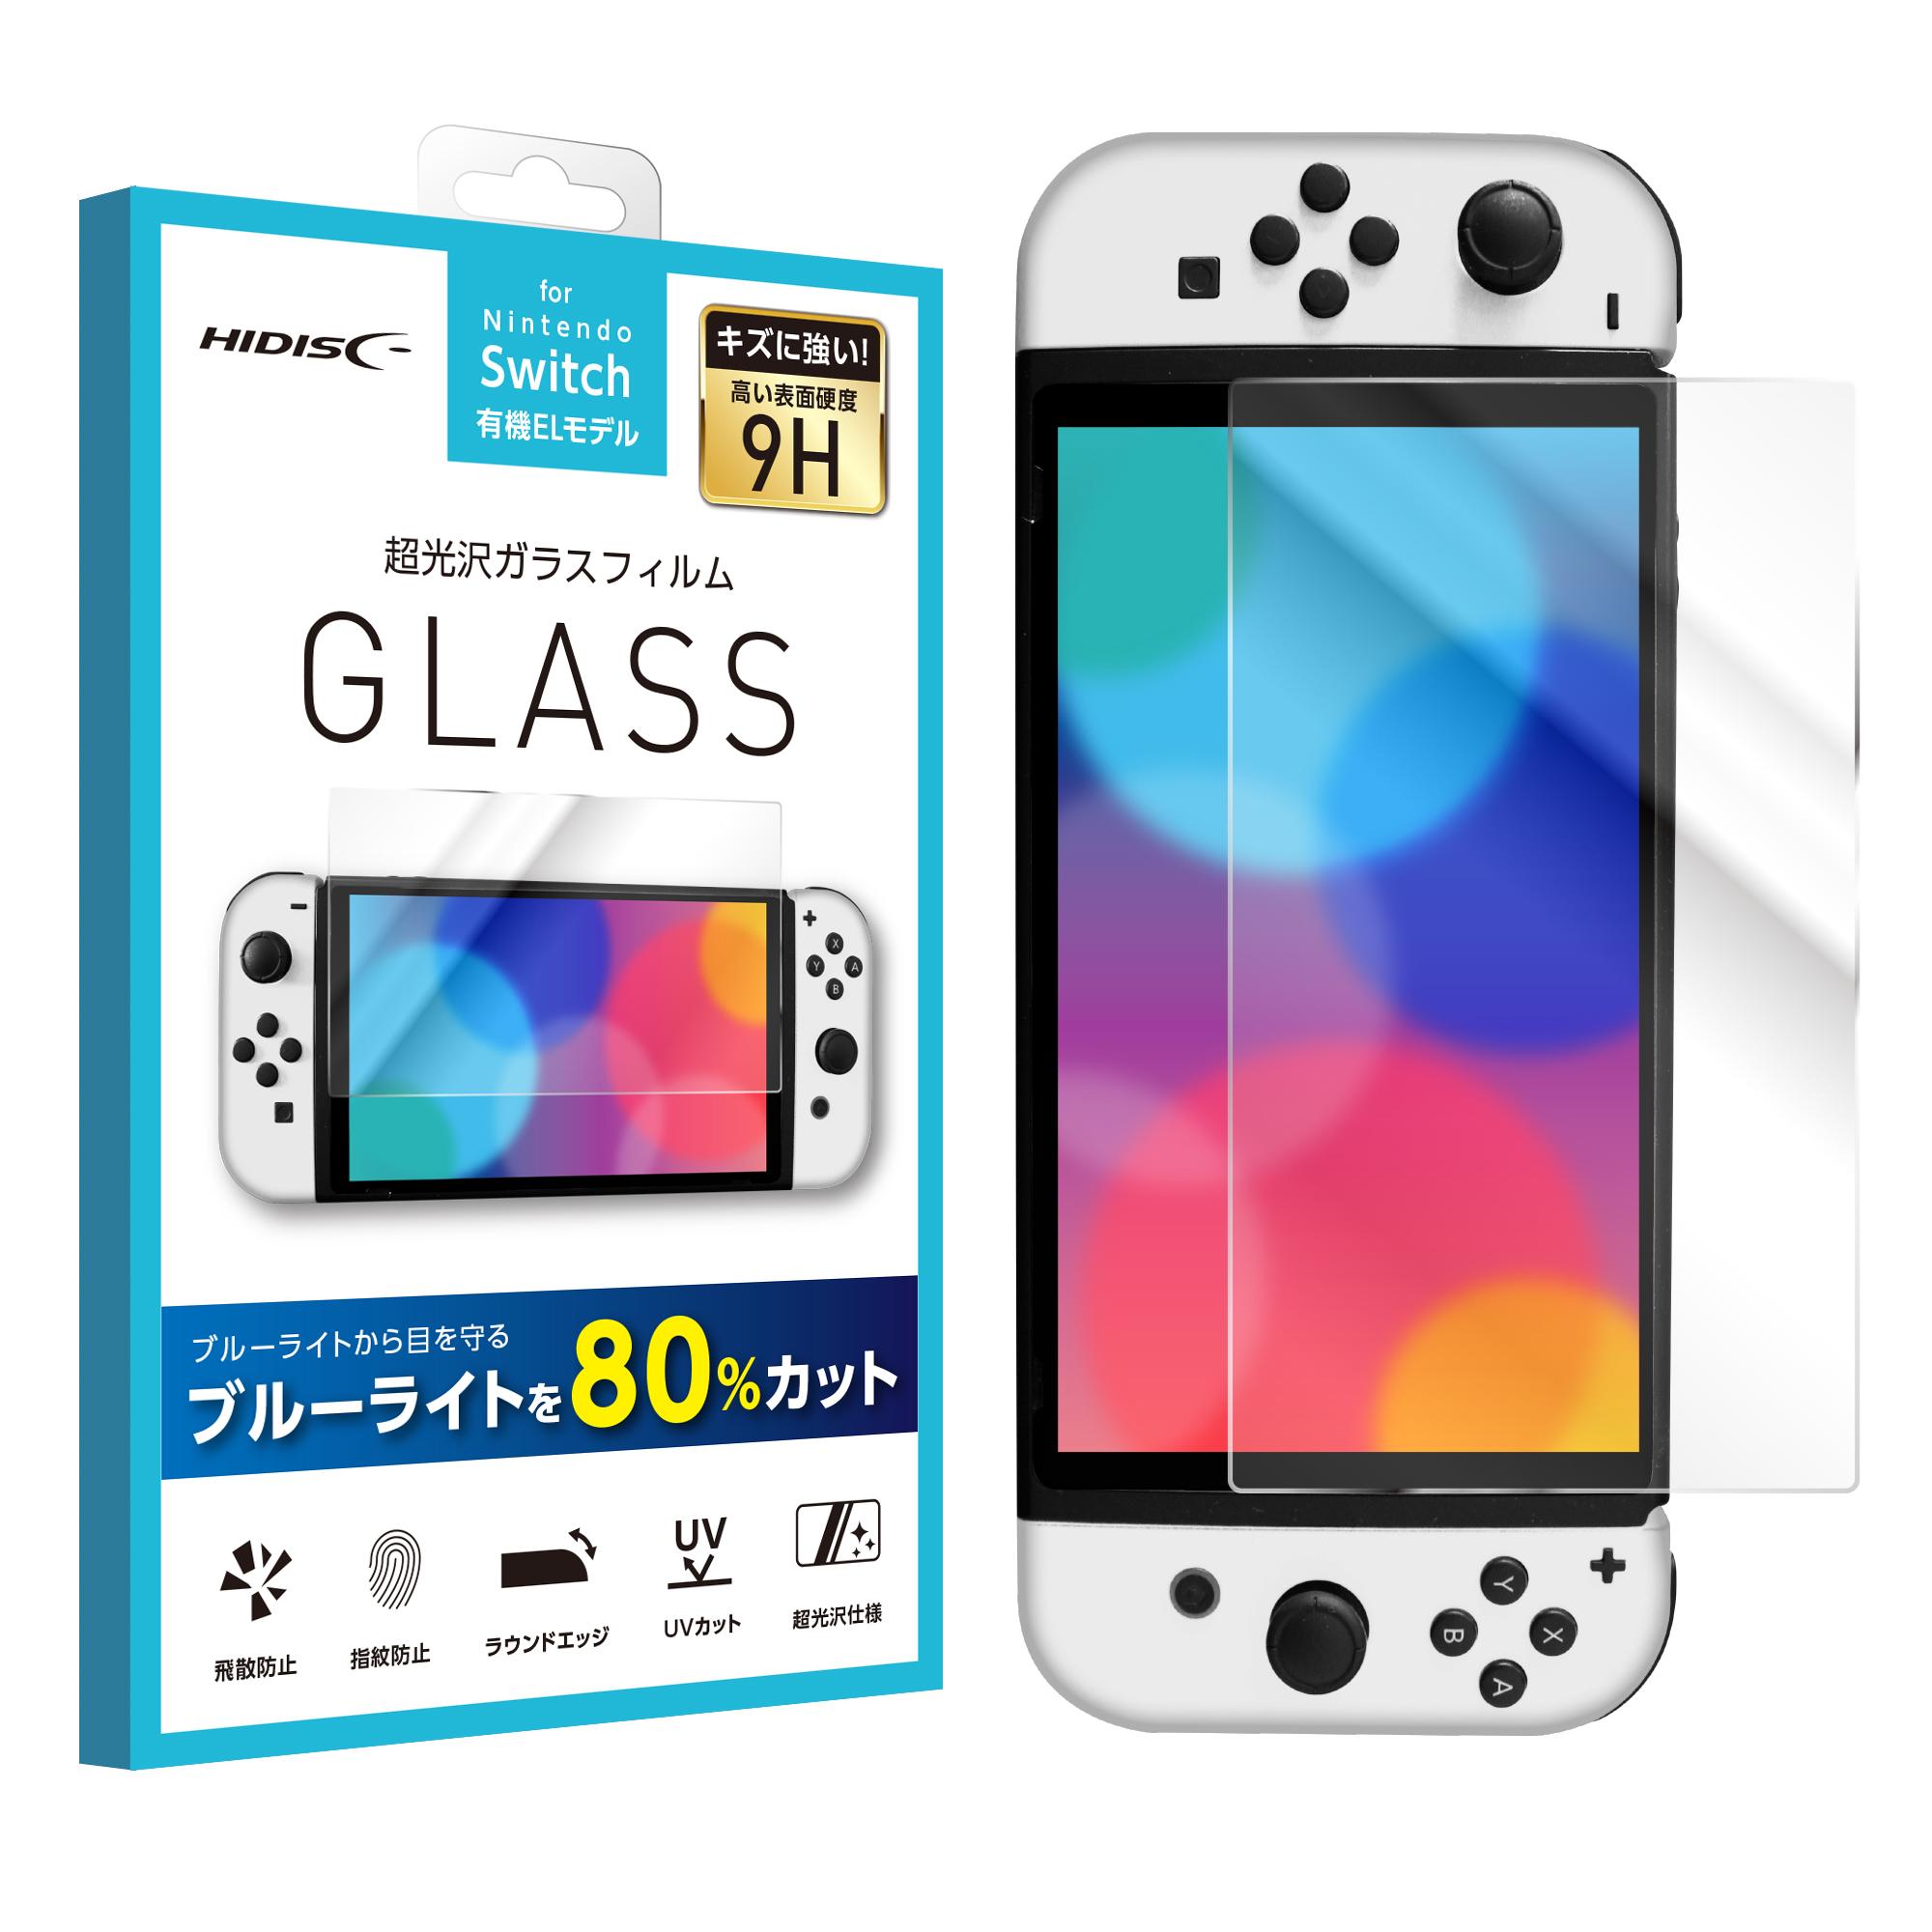 HIDISC 2.5D強化保護ガラスフィルム for Nintendo Switch 有機ELモデル ブルーライトカット機能付き